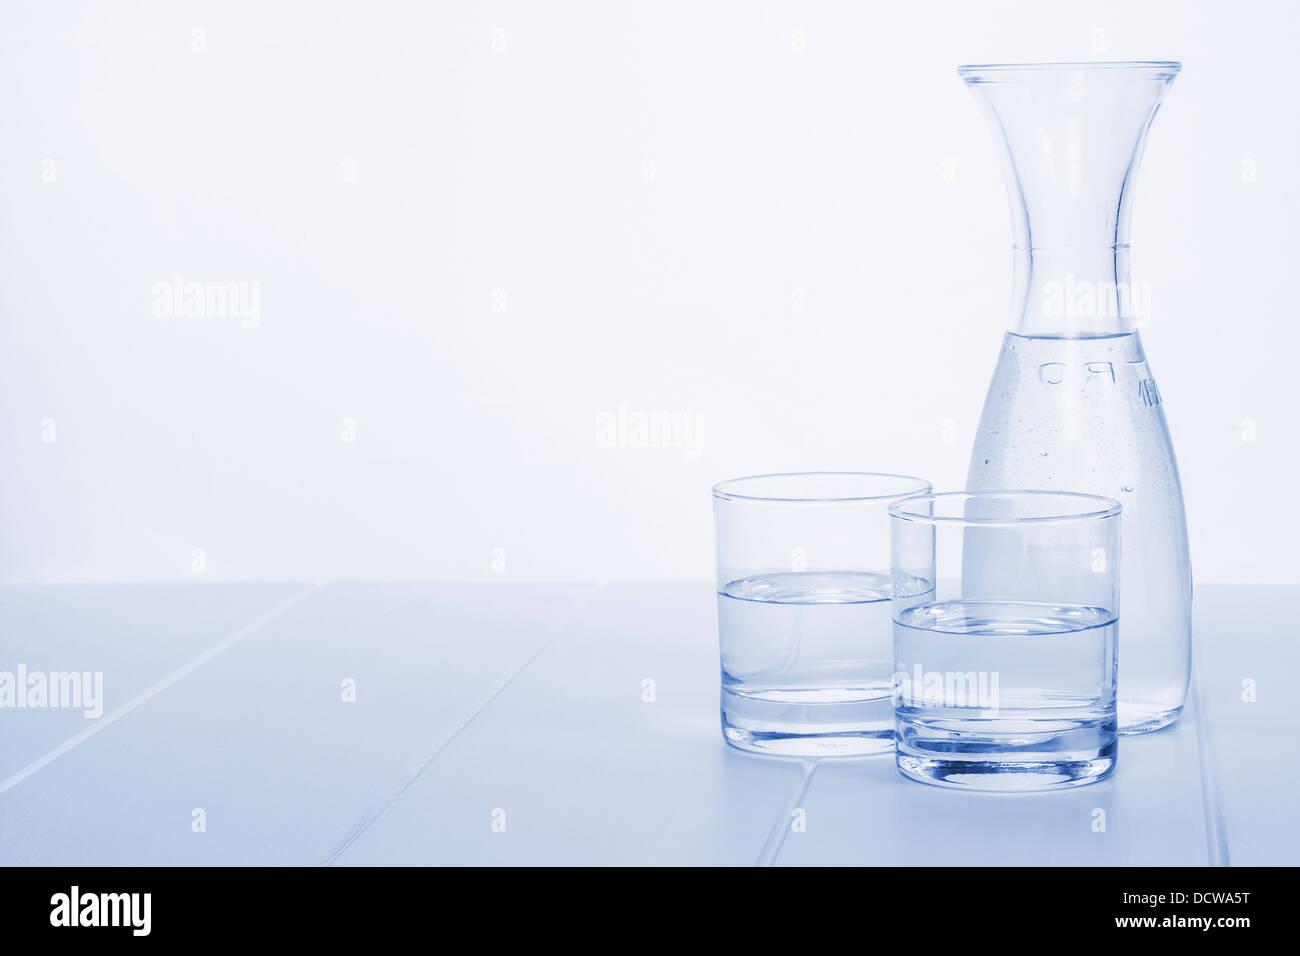 Garrafa de agua y dos copas: una garrafa de agua sobre una mesa con dos copas, en tonos de azul, horizontal. Imagen De Stock